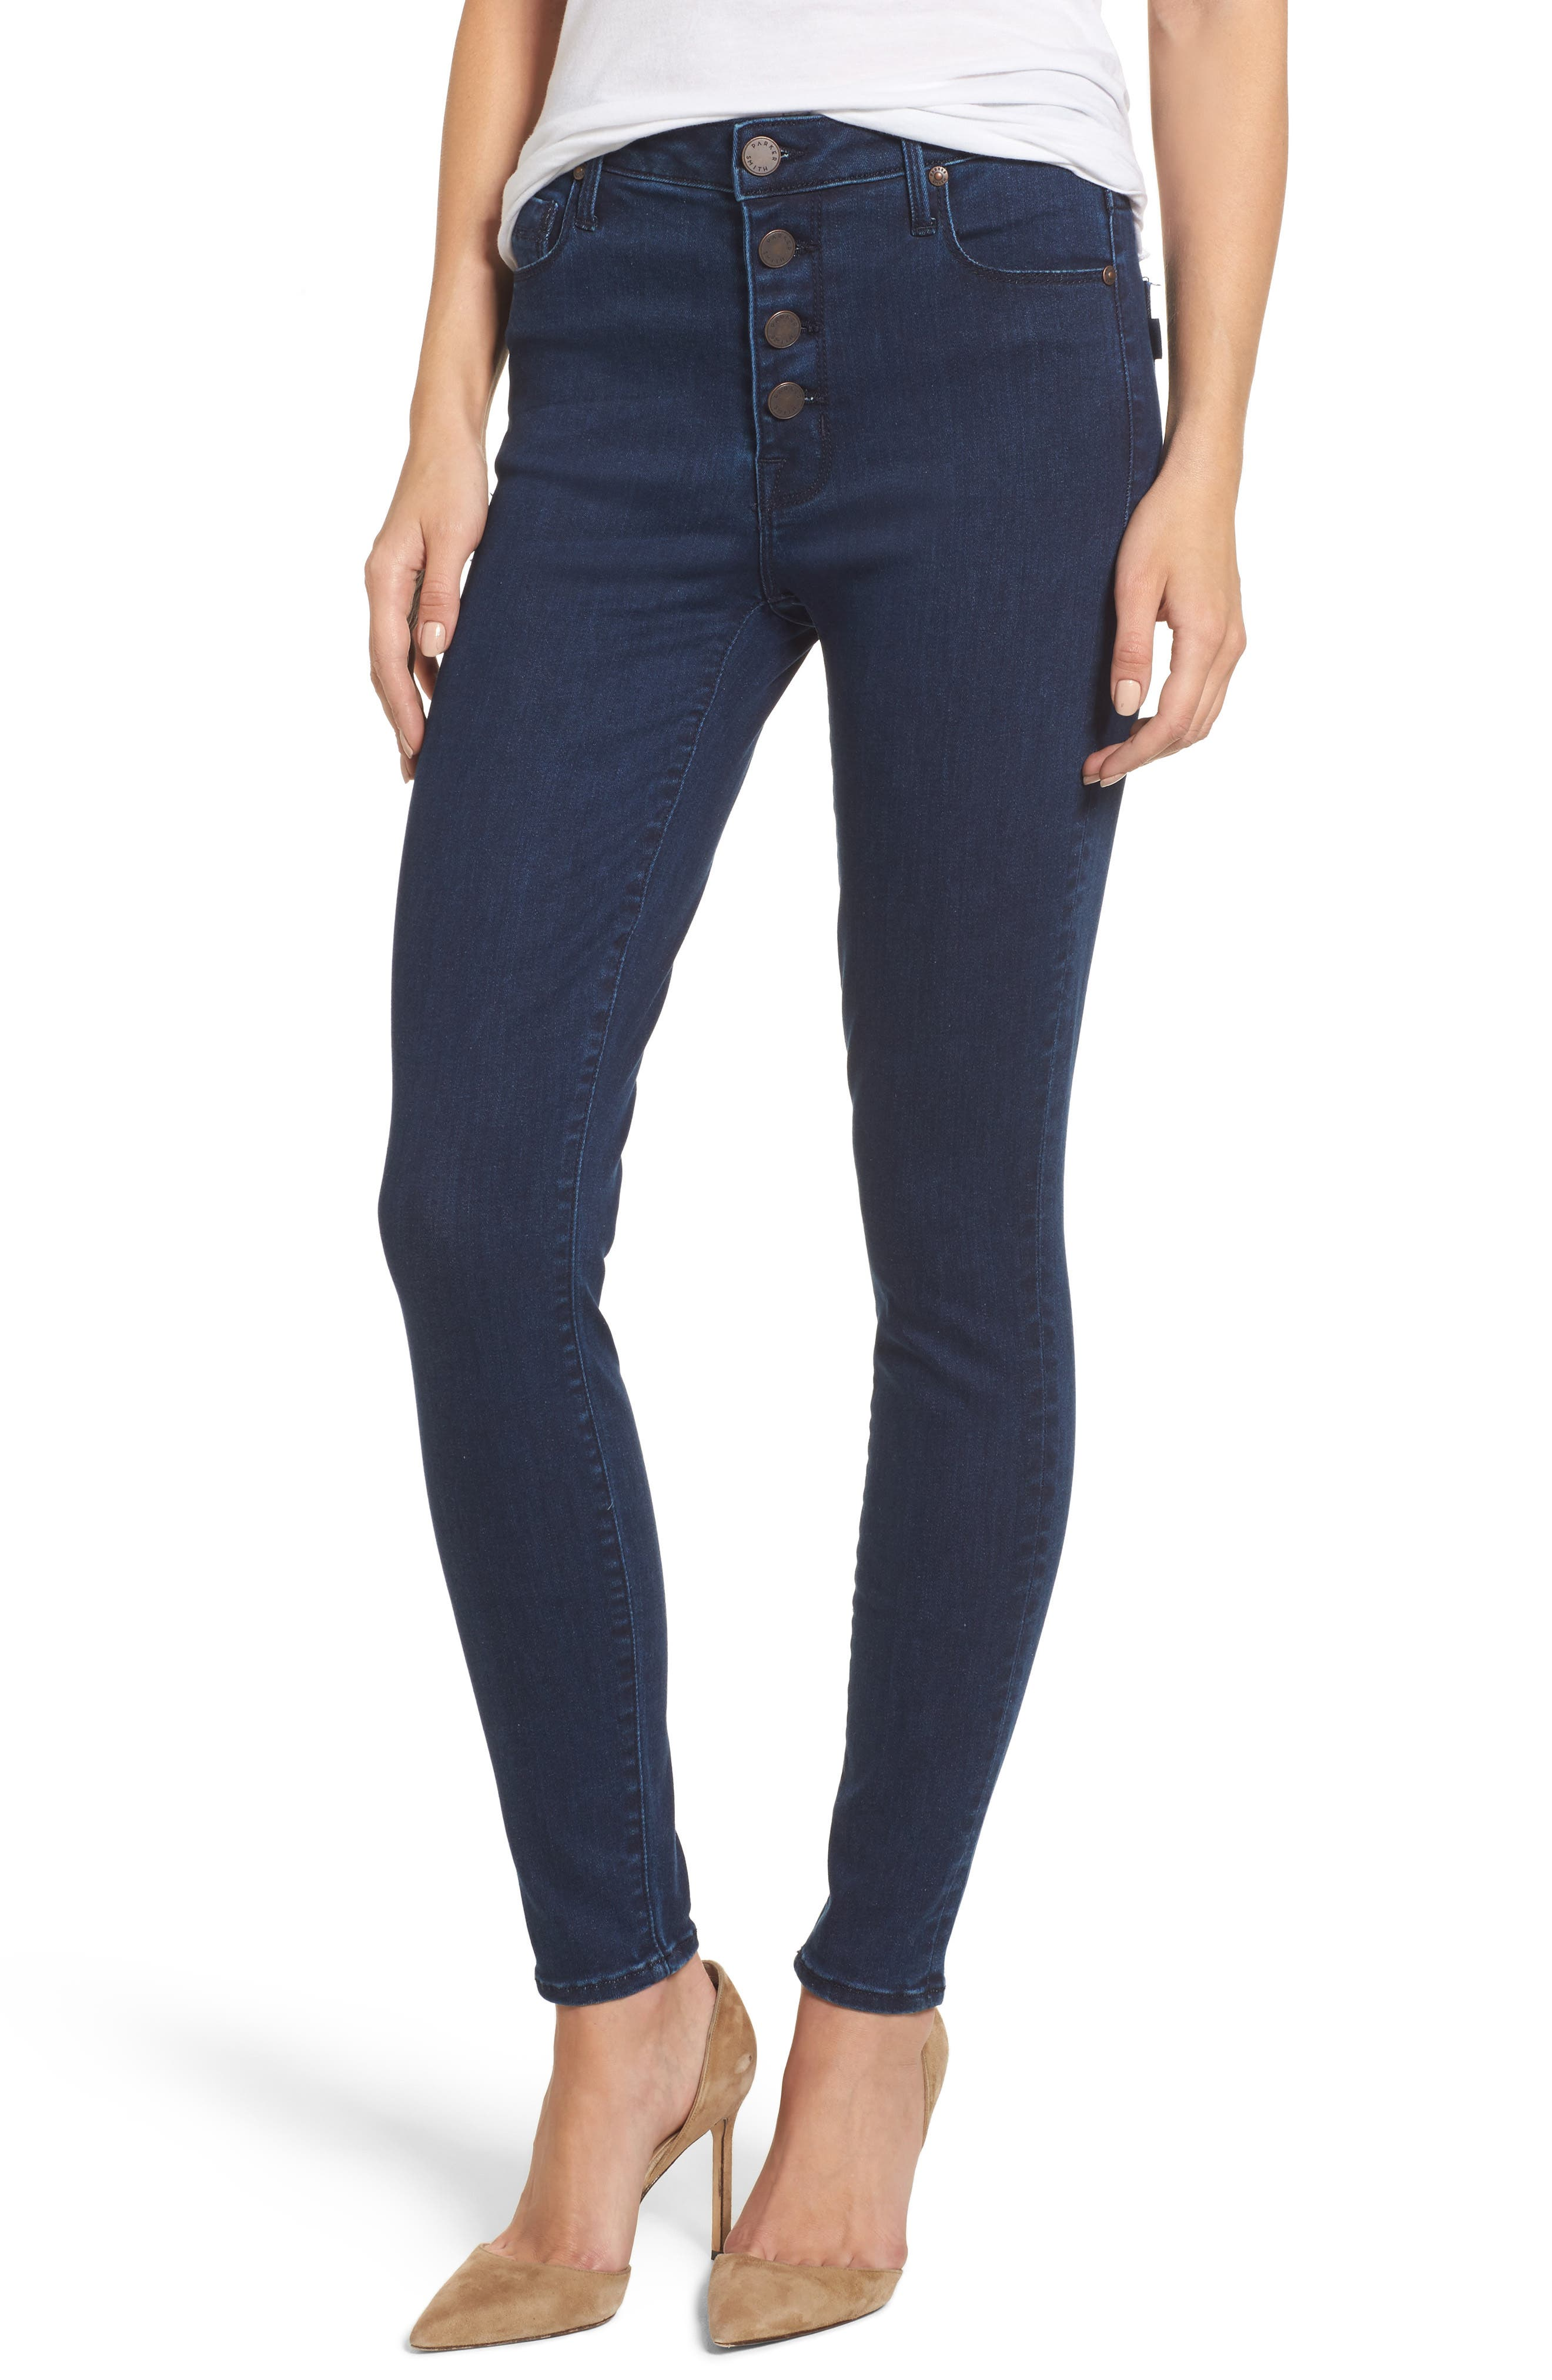 Alternate Image 1 Selected - Parker Smith Bombshell High Waist Skinny Jeans (Sky Line)